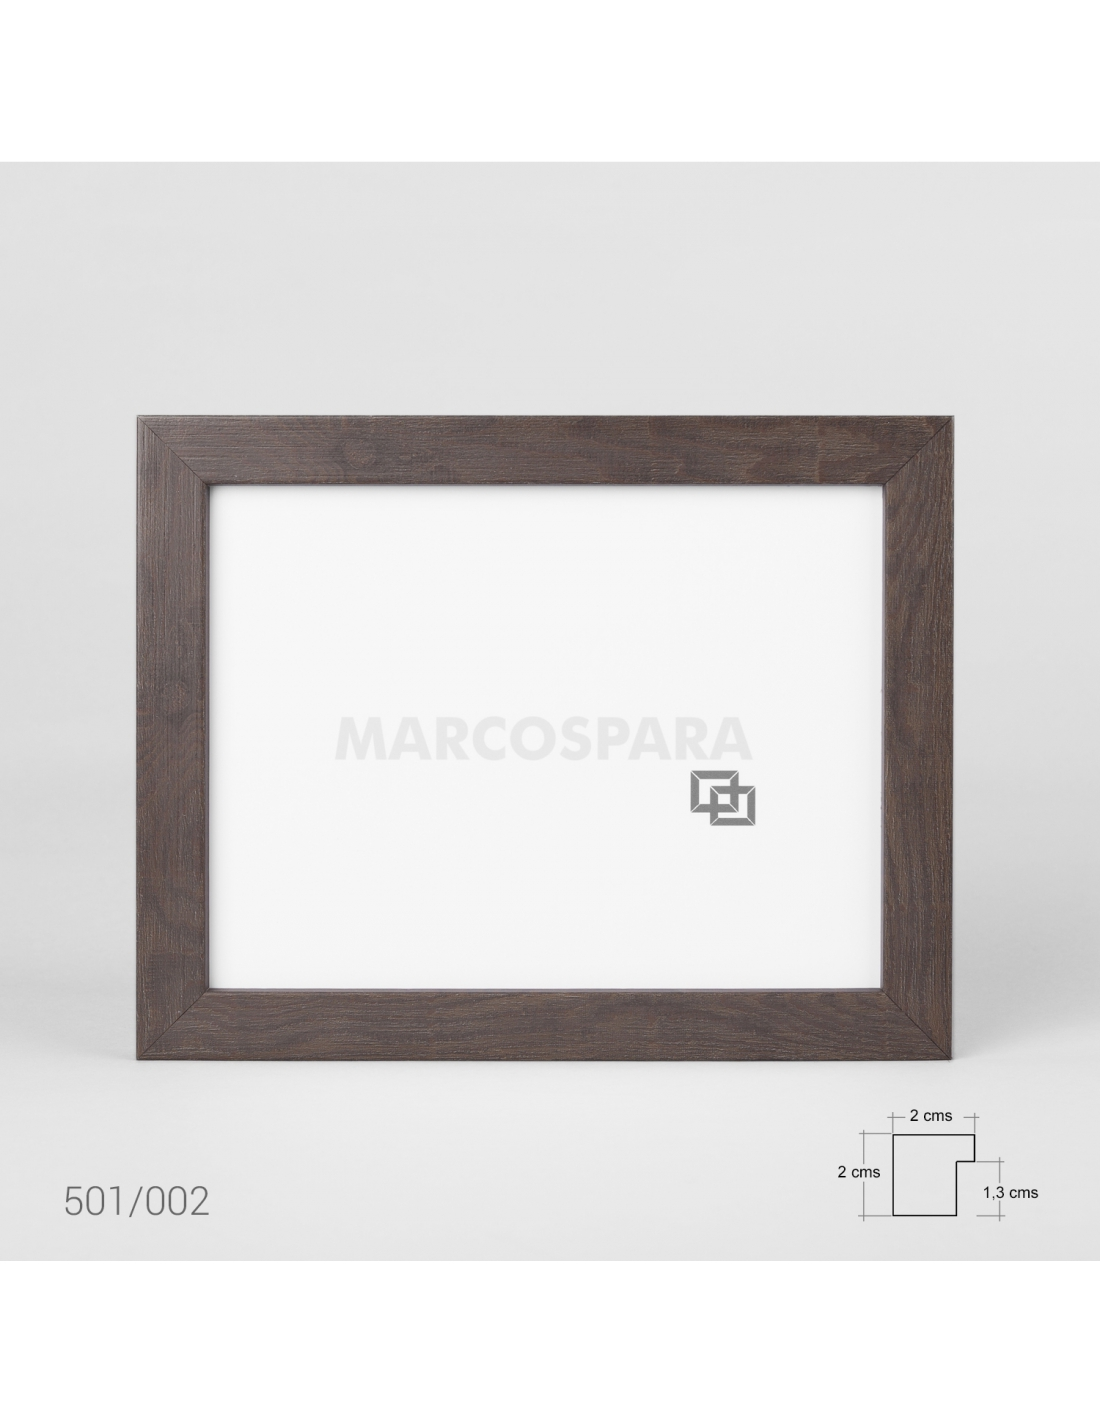 Marcos de madera para posters M501